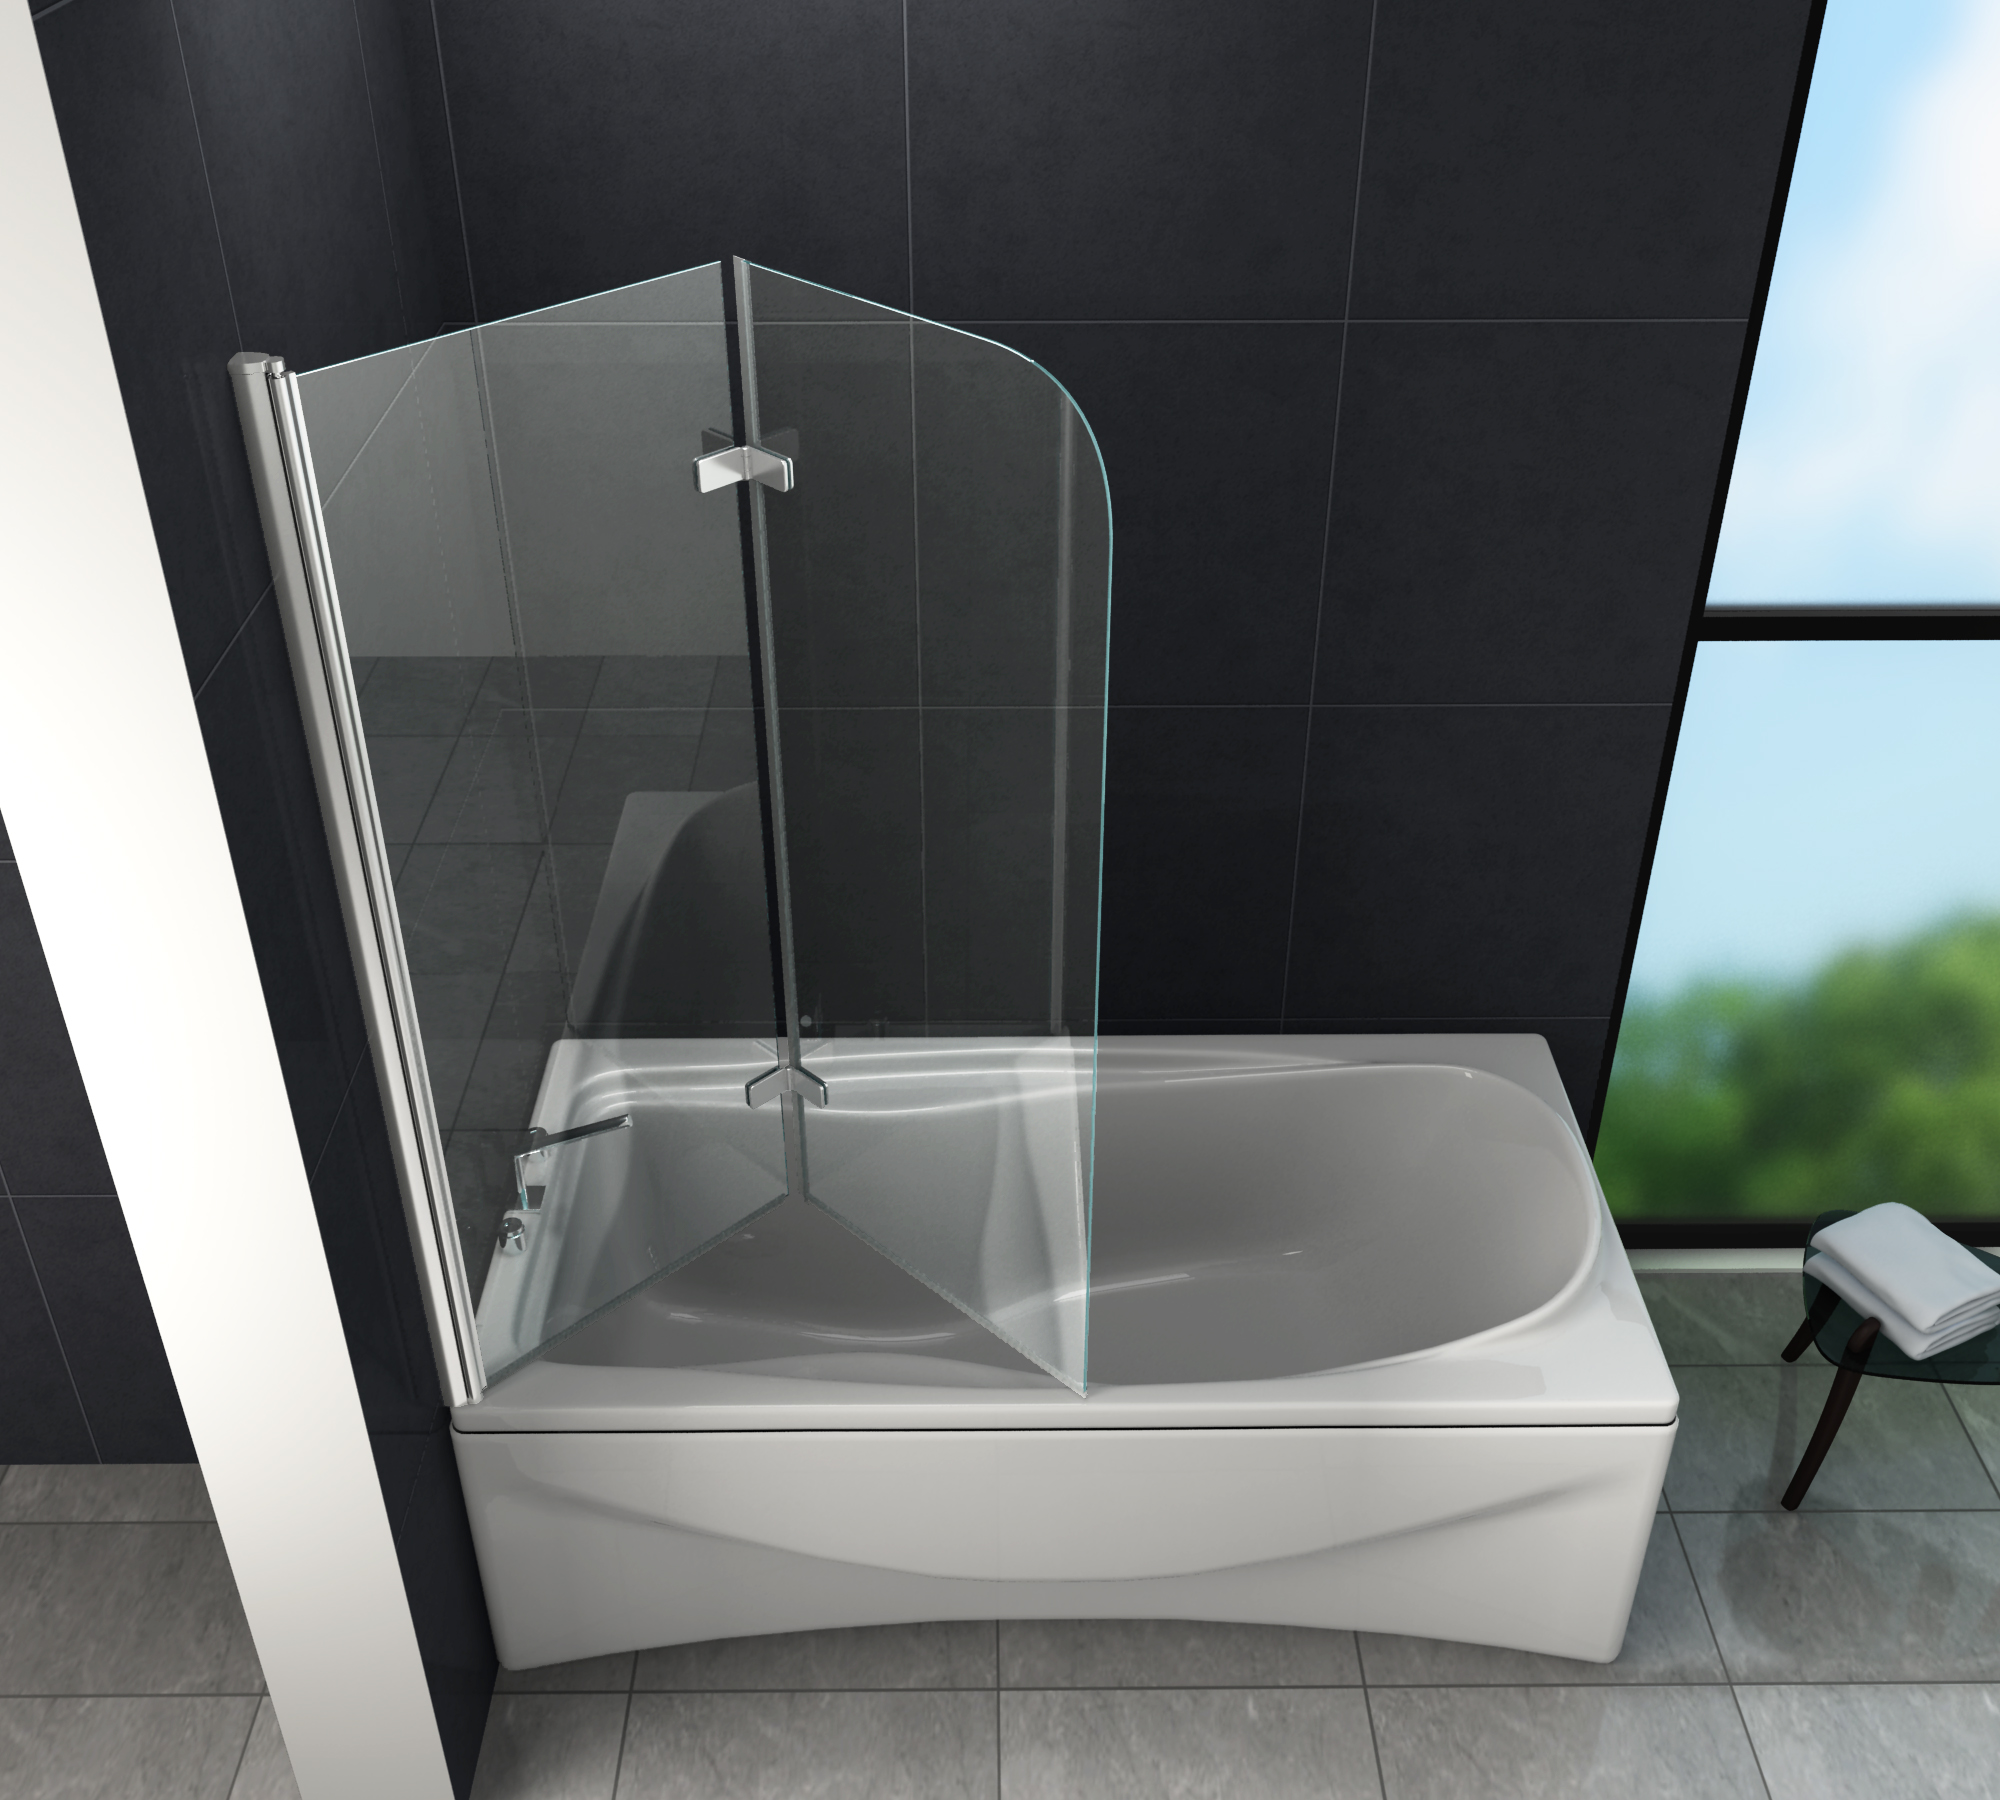 Duschtrennwand brease 100 x 140 badewanne glasdeals - Badewanne duschtrennwand ...